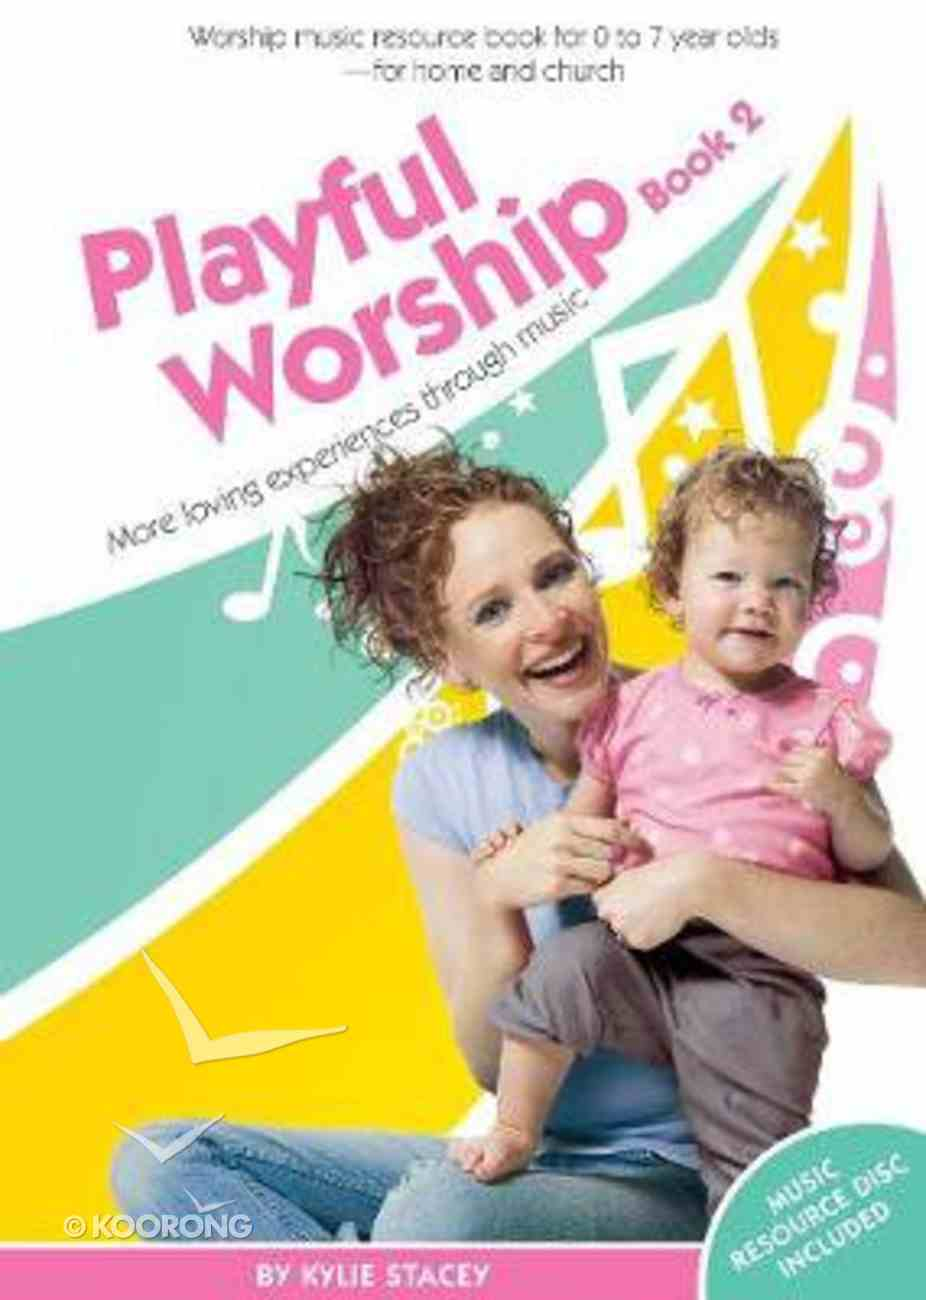 Playful Worship (Book 2) Paperback